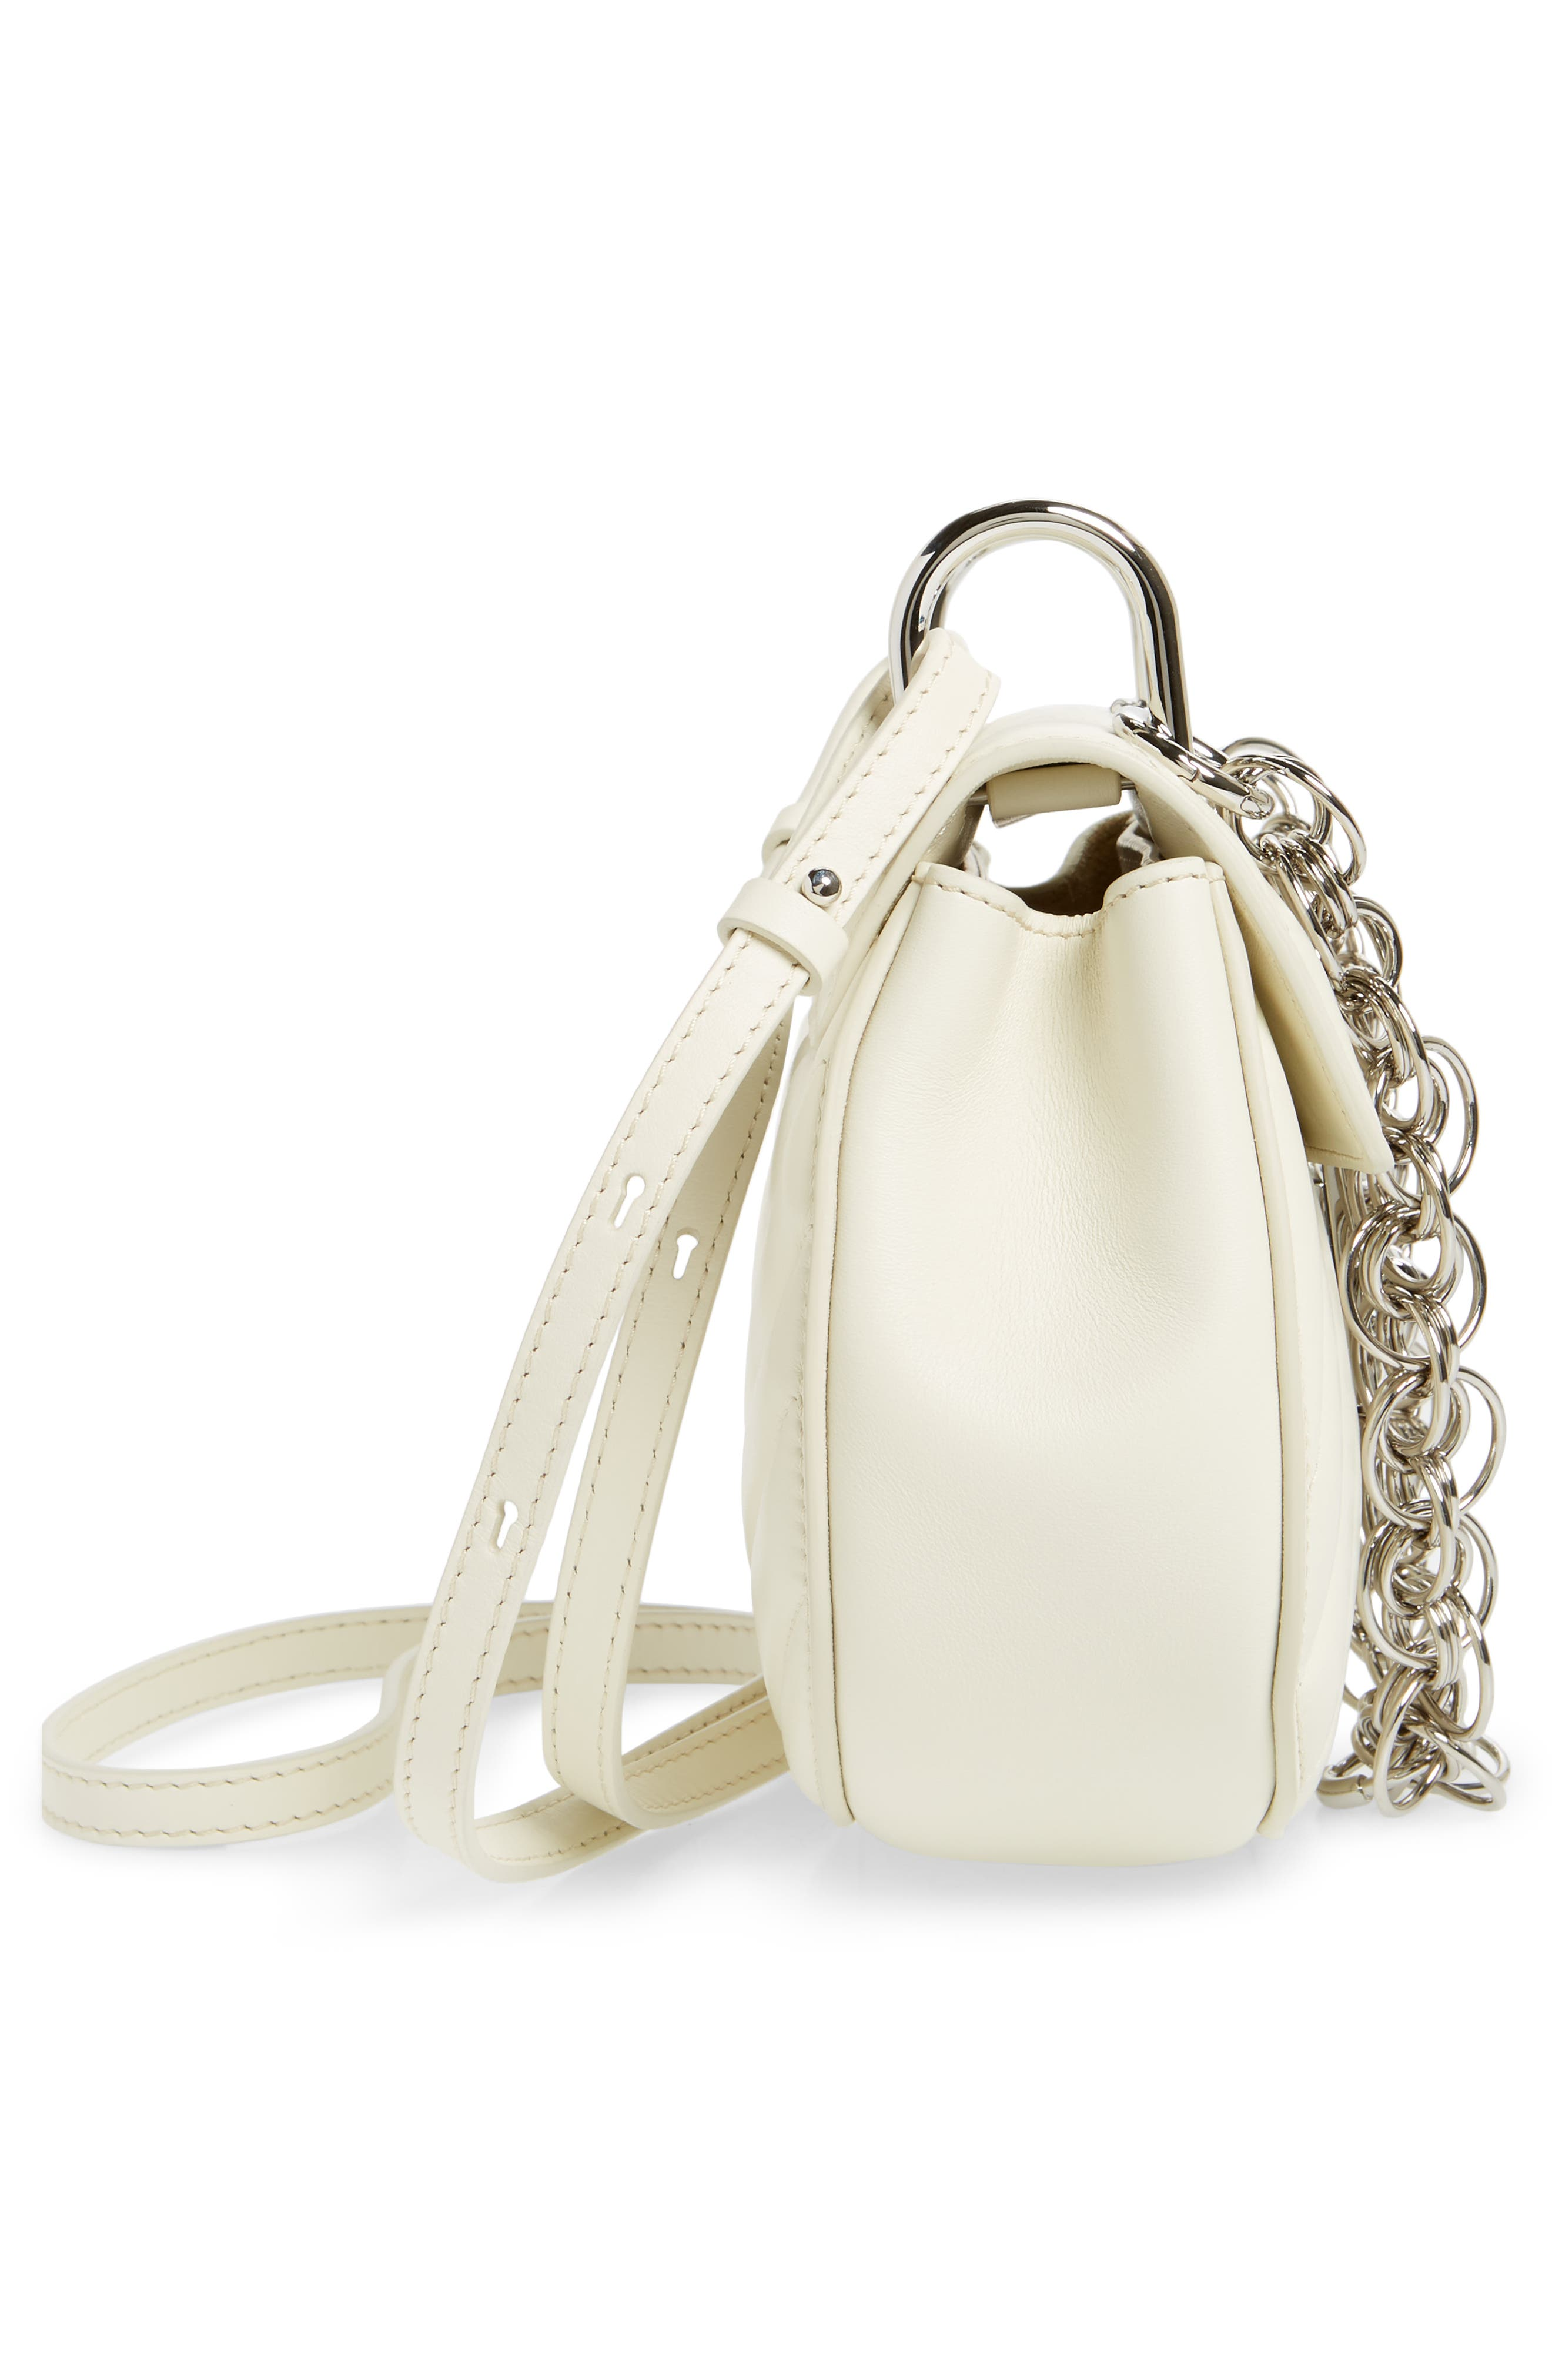 Mini Drew Bijoux Leather Shoulder Bag,                             Alternate thumbnail 7, color,                             Natural White